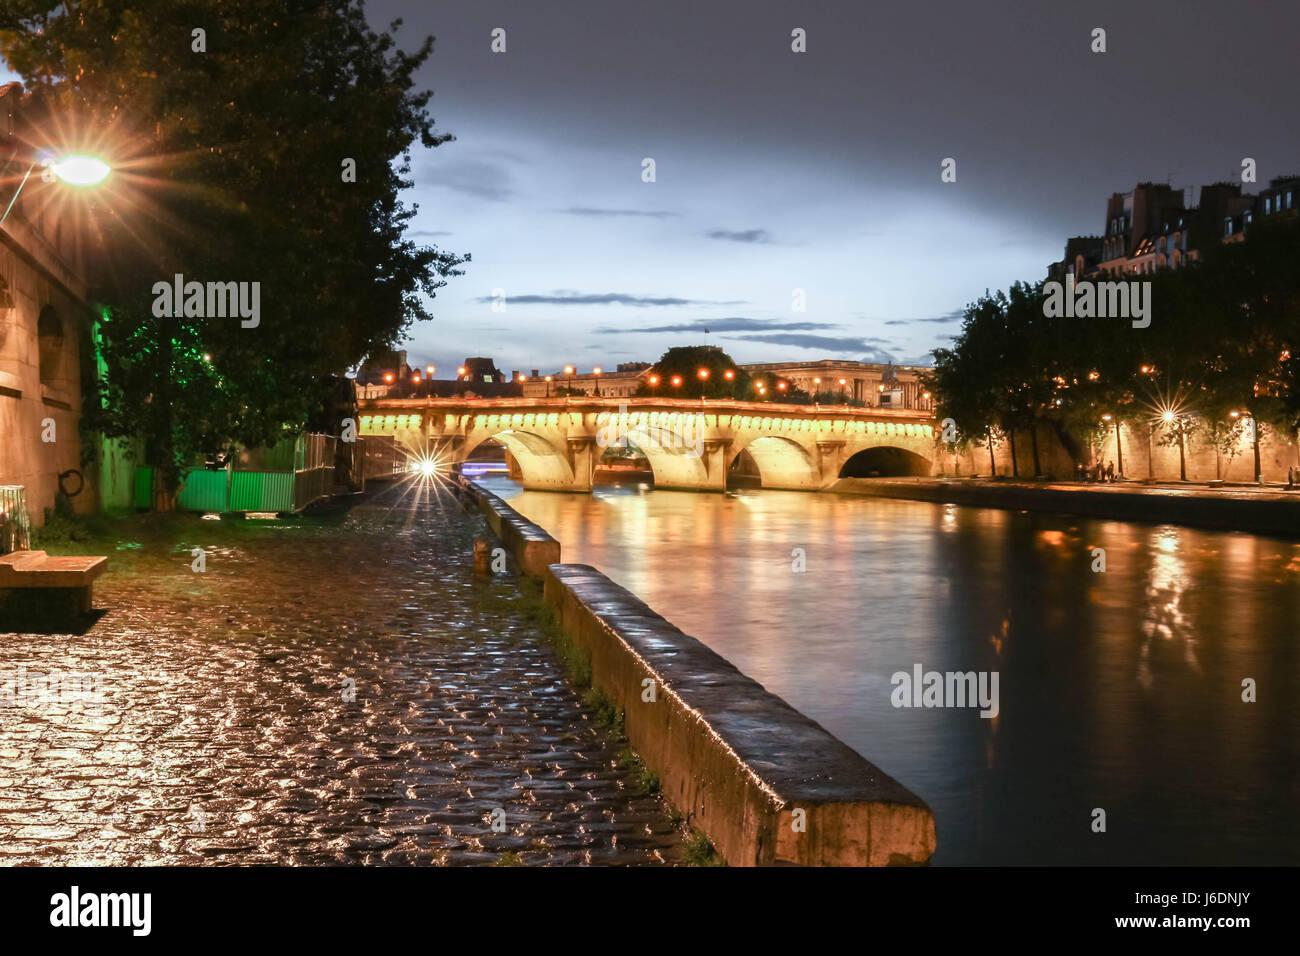 The Pont Neuf (Neuf Bridge) of Paris at dawn. - Stock Image